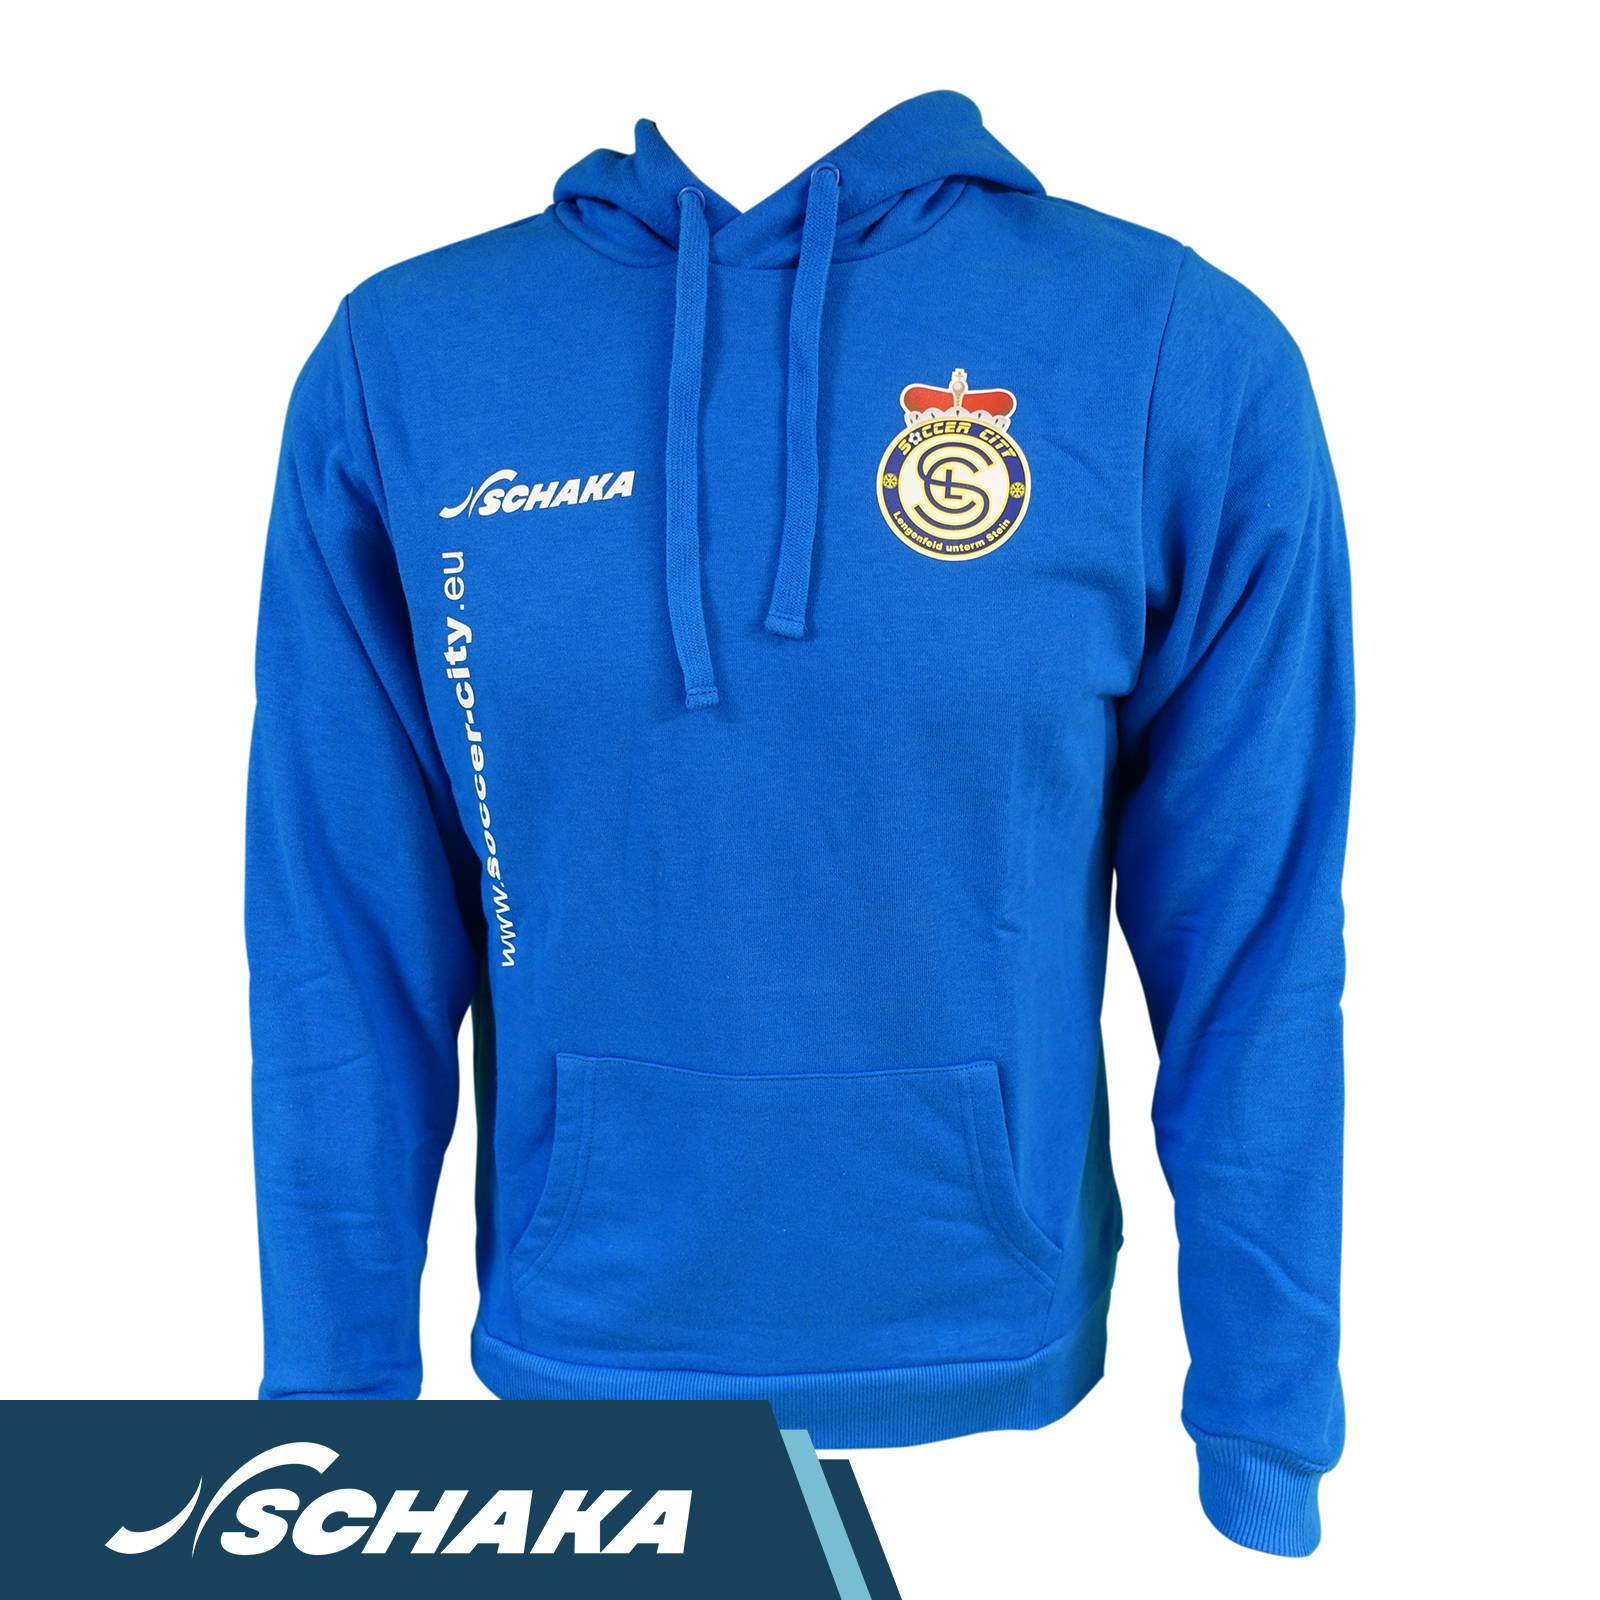 Schaka Hoodie MUA Soccer City Edition